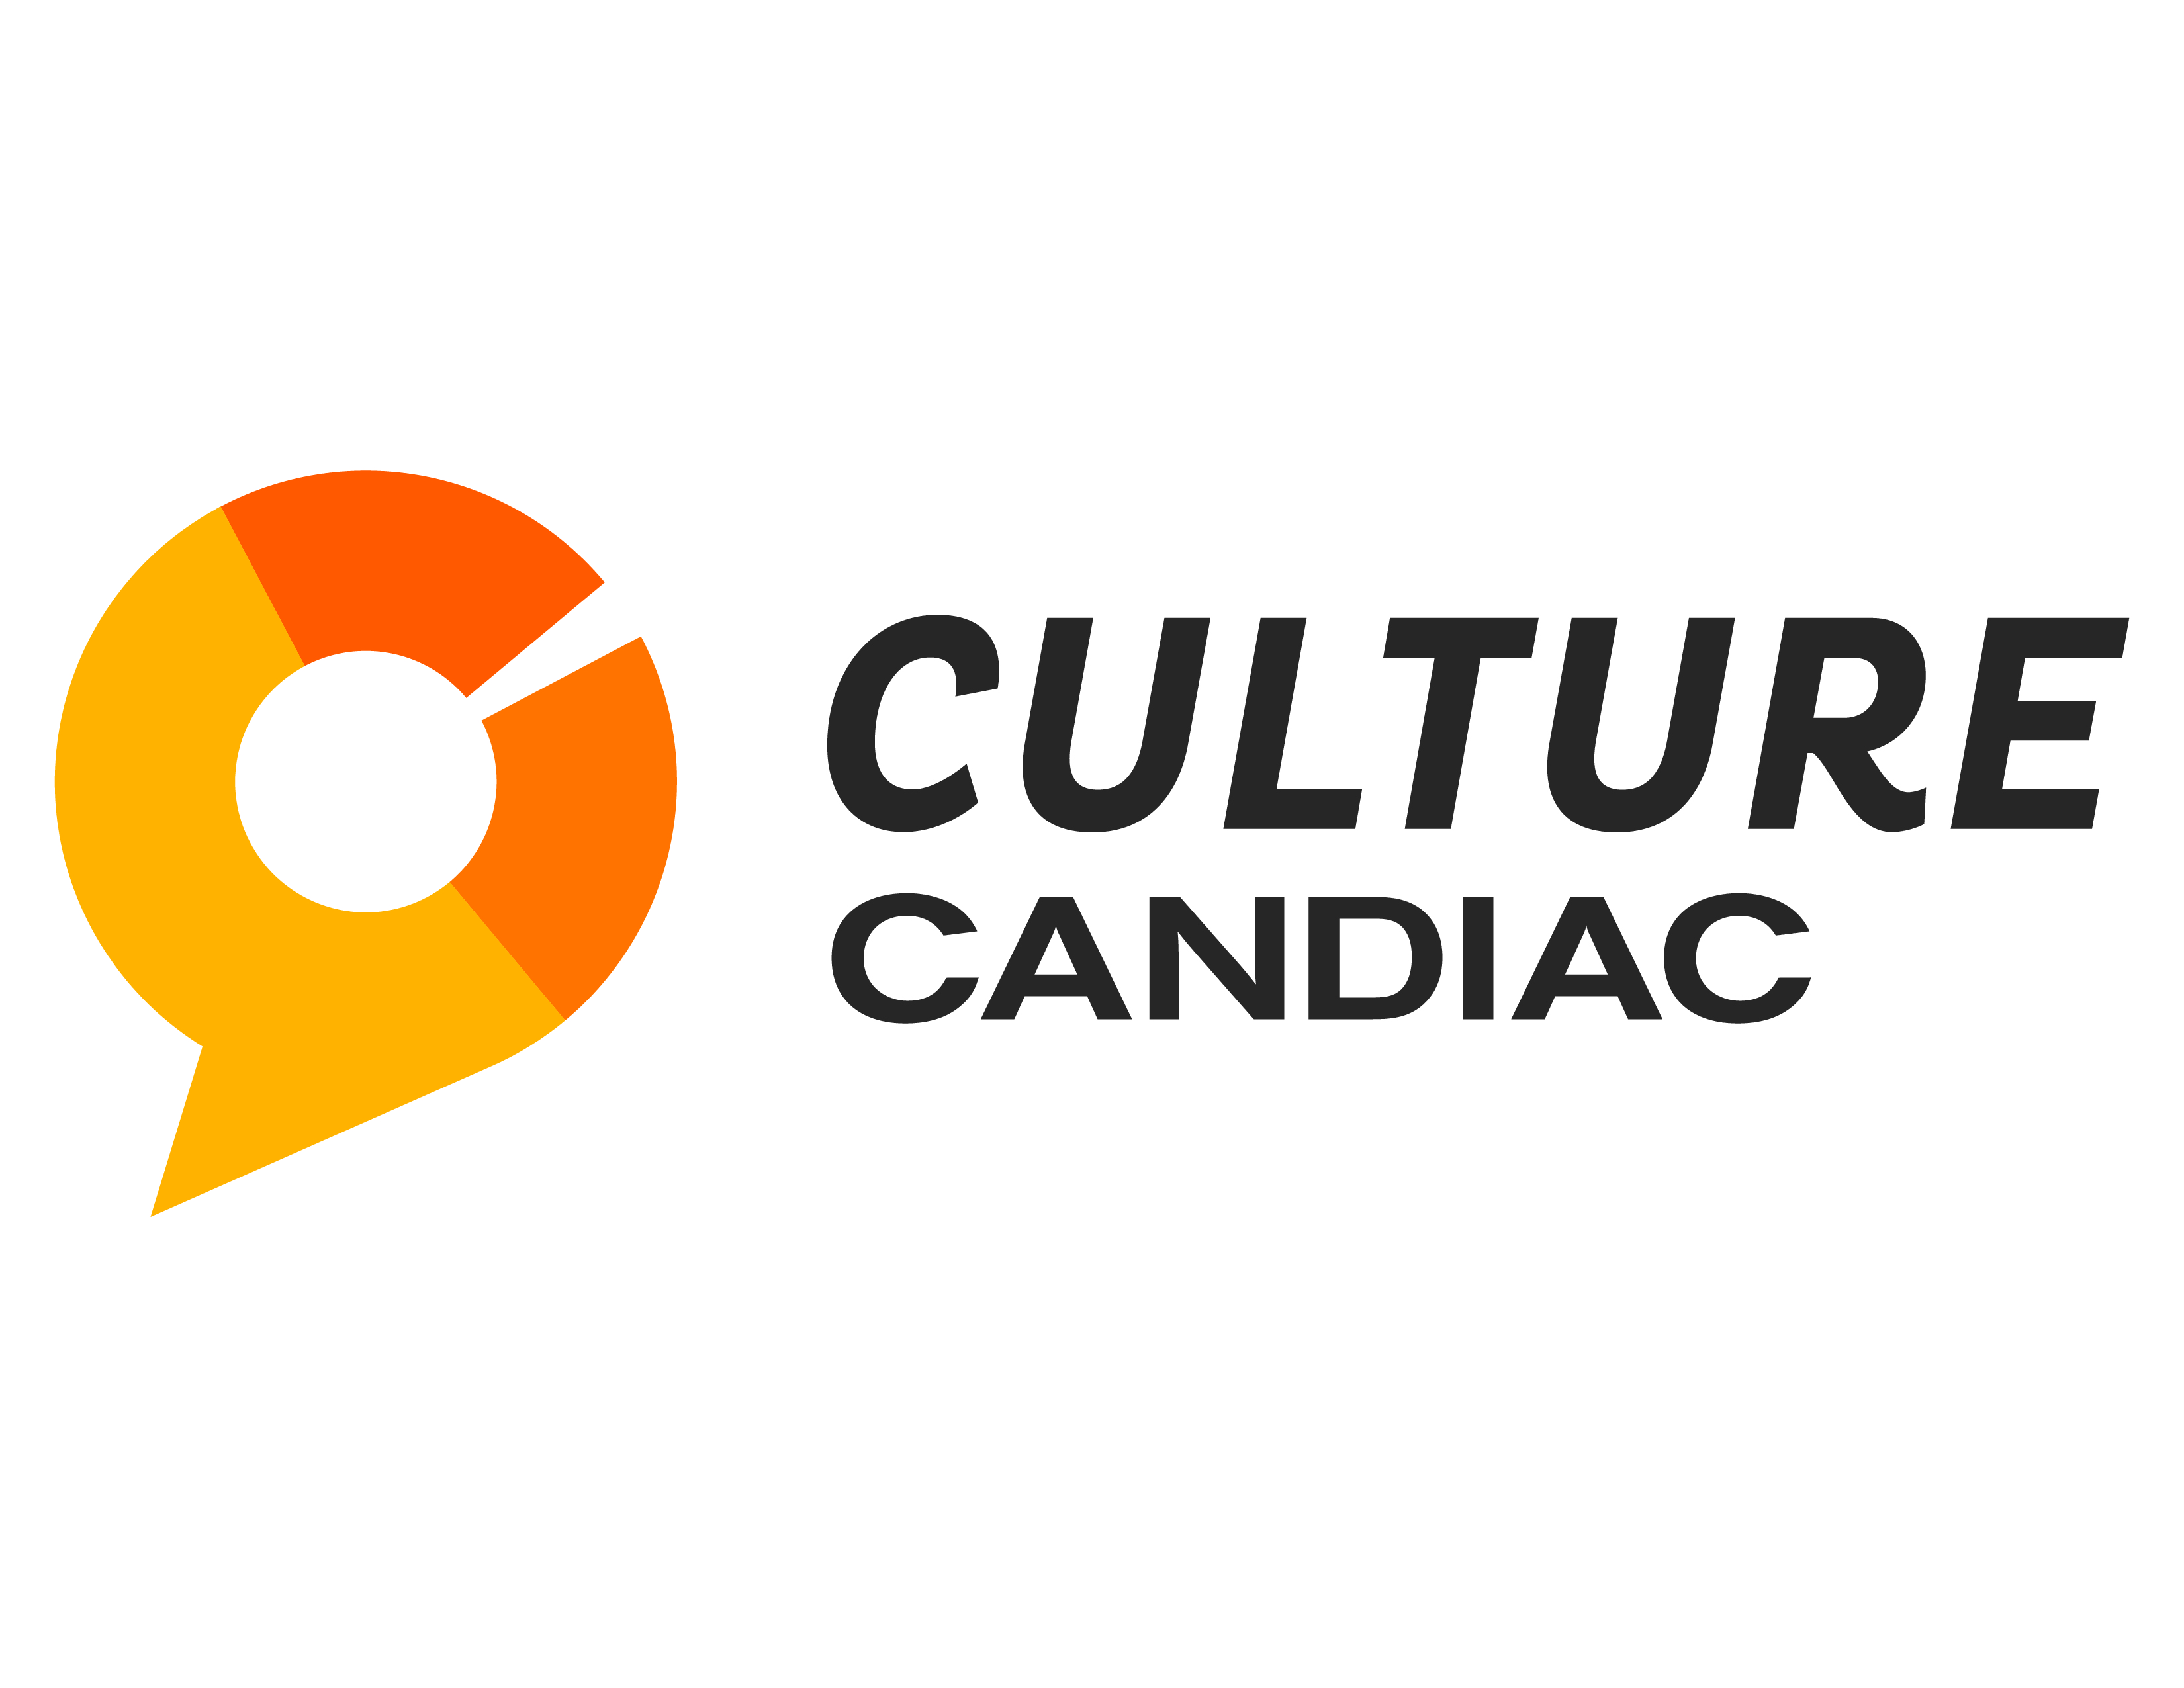 D-7817_Politique_culturelle_logo_Std_horizontal.jpg (357 KB)